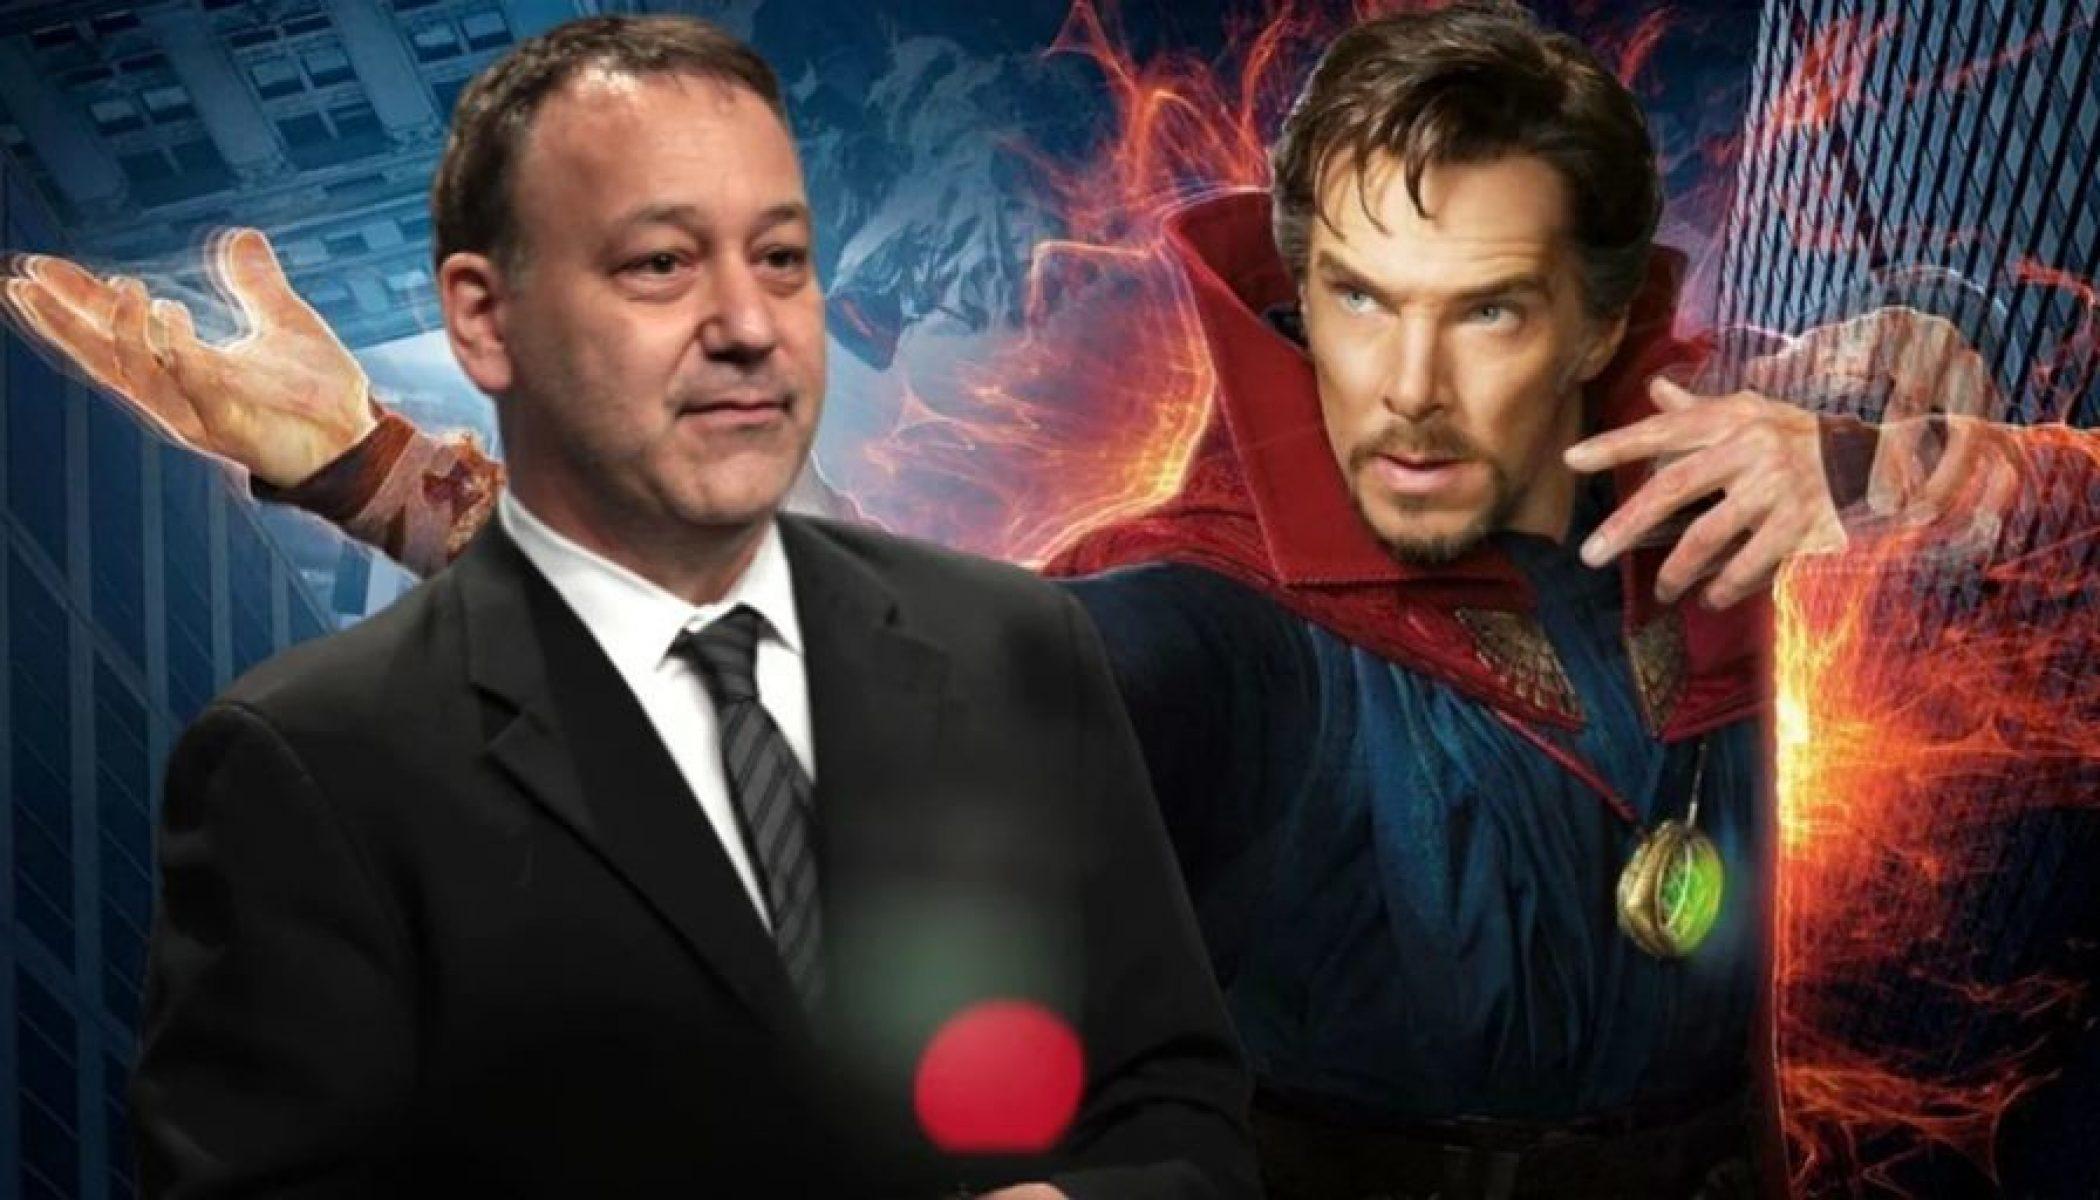 Sam Raimi confirma ser director de Doctor Strange in the Multiverse of Madness de Marvel